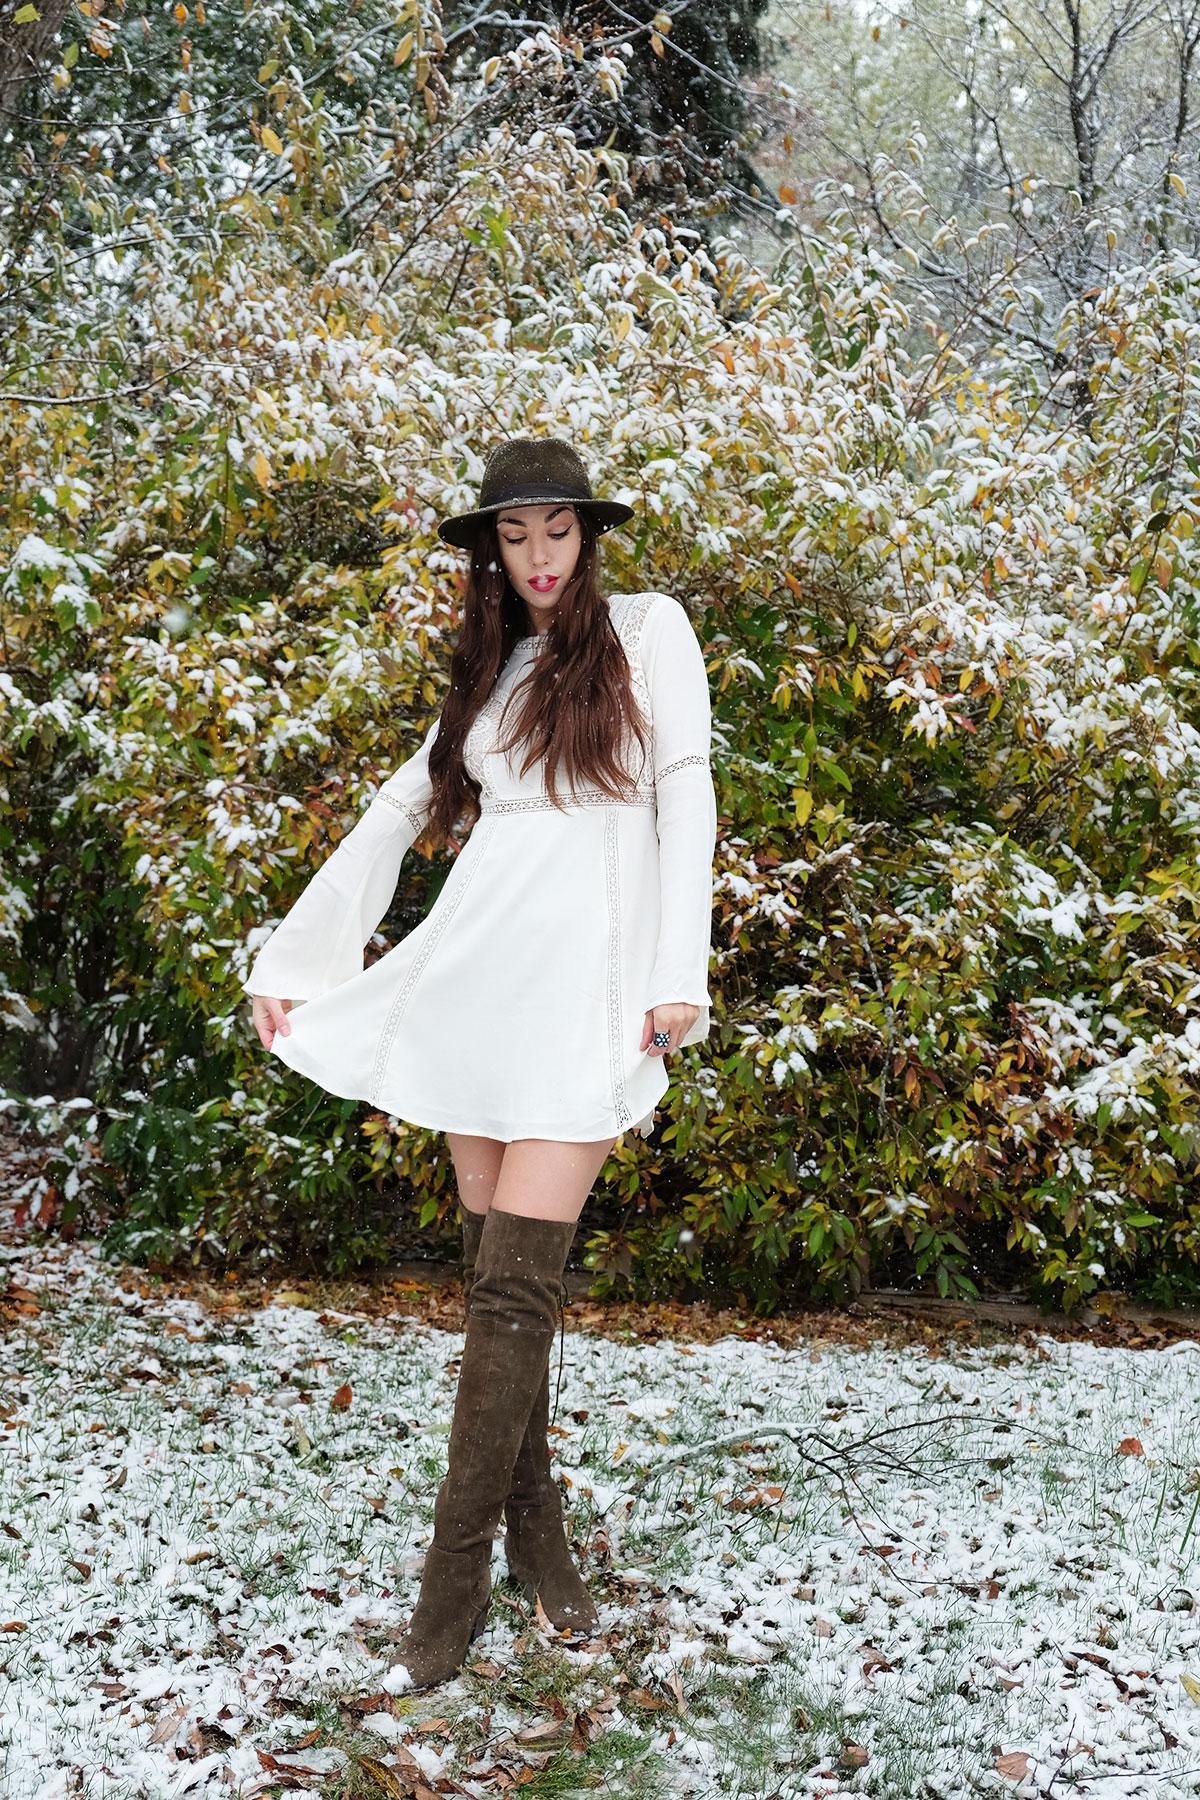 snow_7_sml.jpg